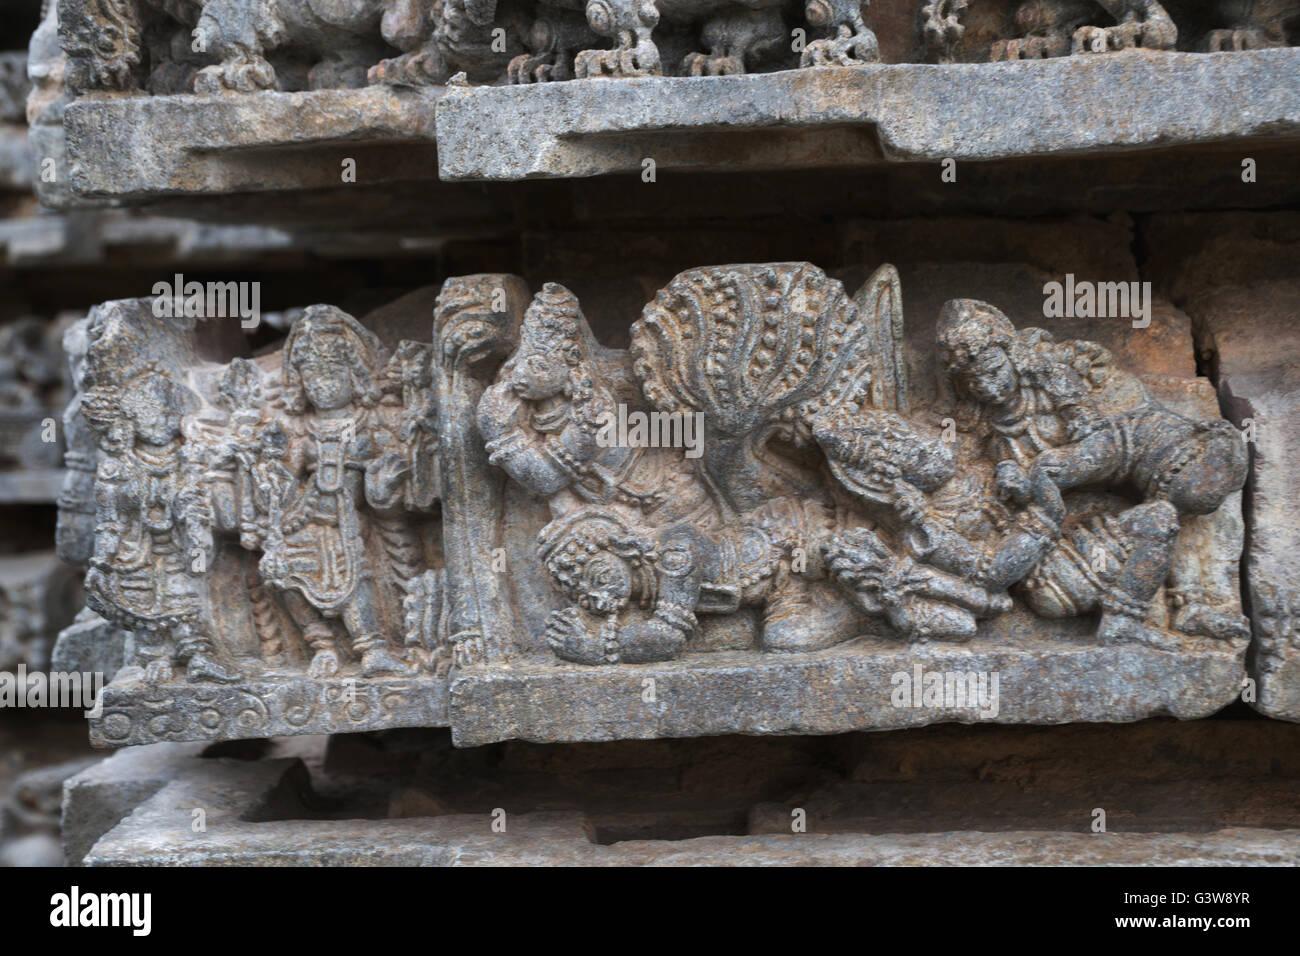 Ornate bas reliefs depicting scene from Mahabharata, Kedareshwara temple, Halebidu, Karnataka, india. - Stock Image